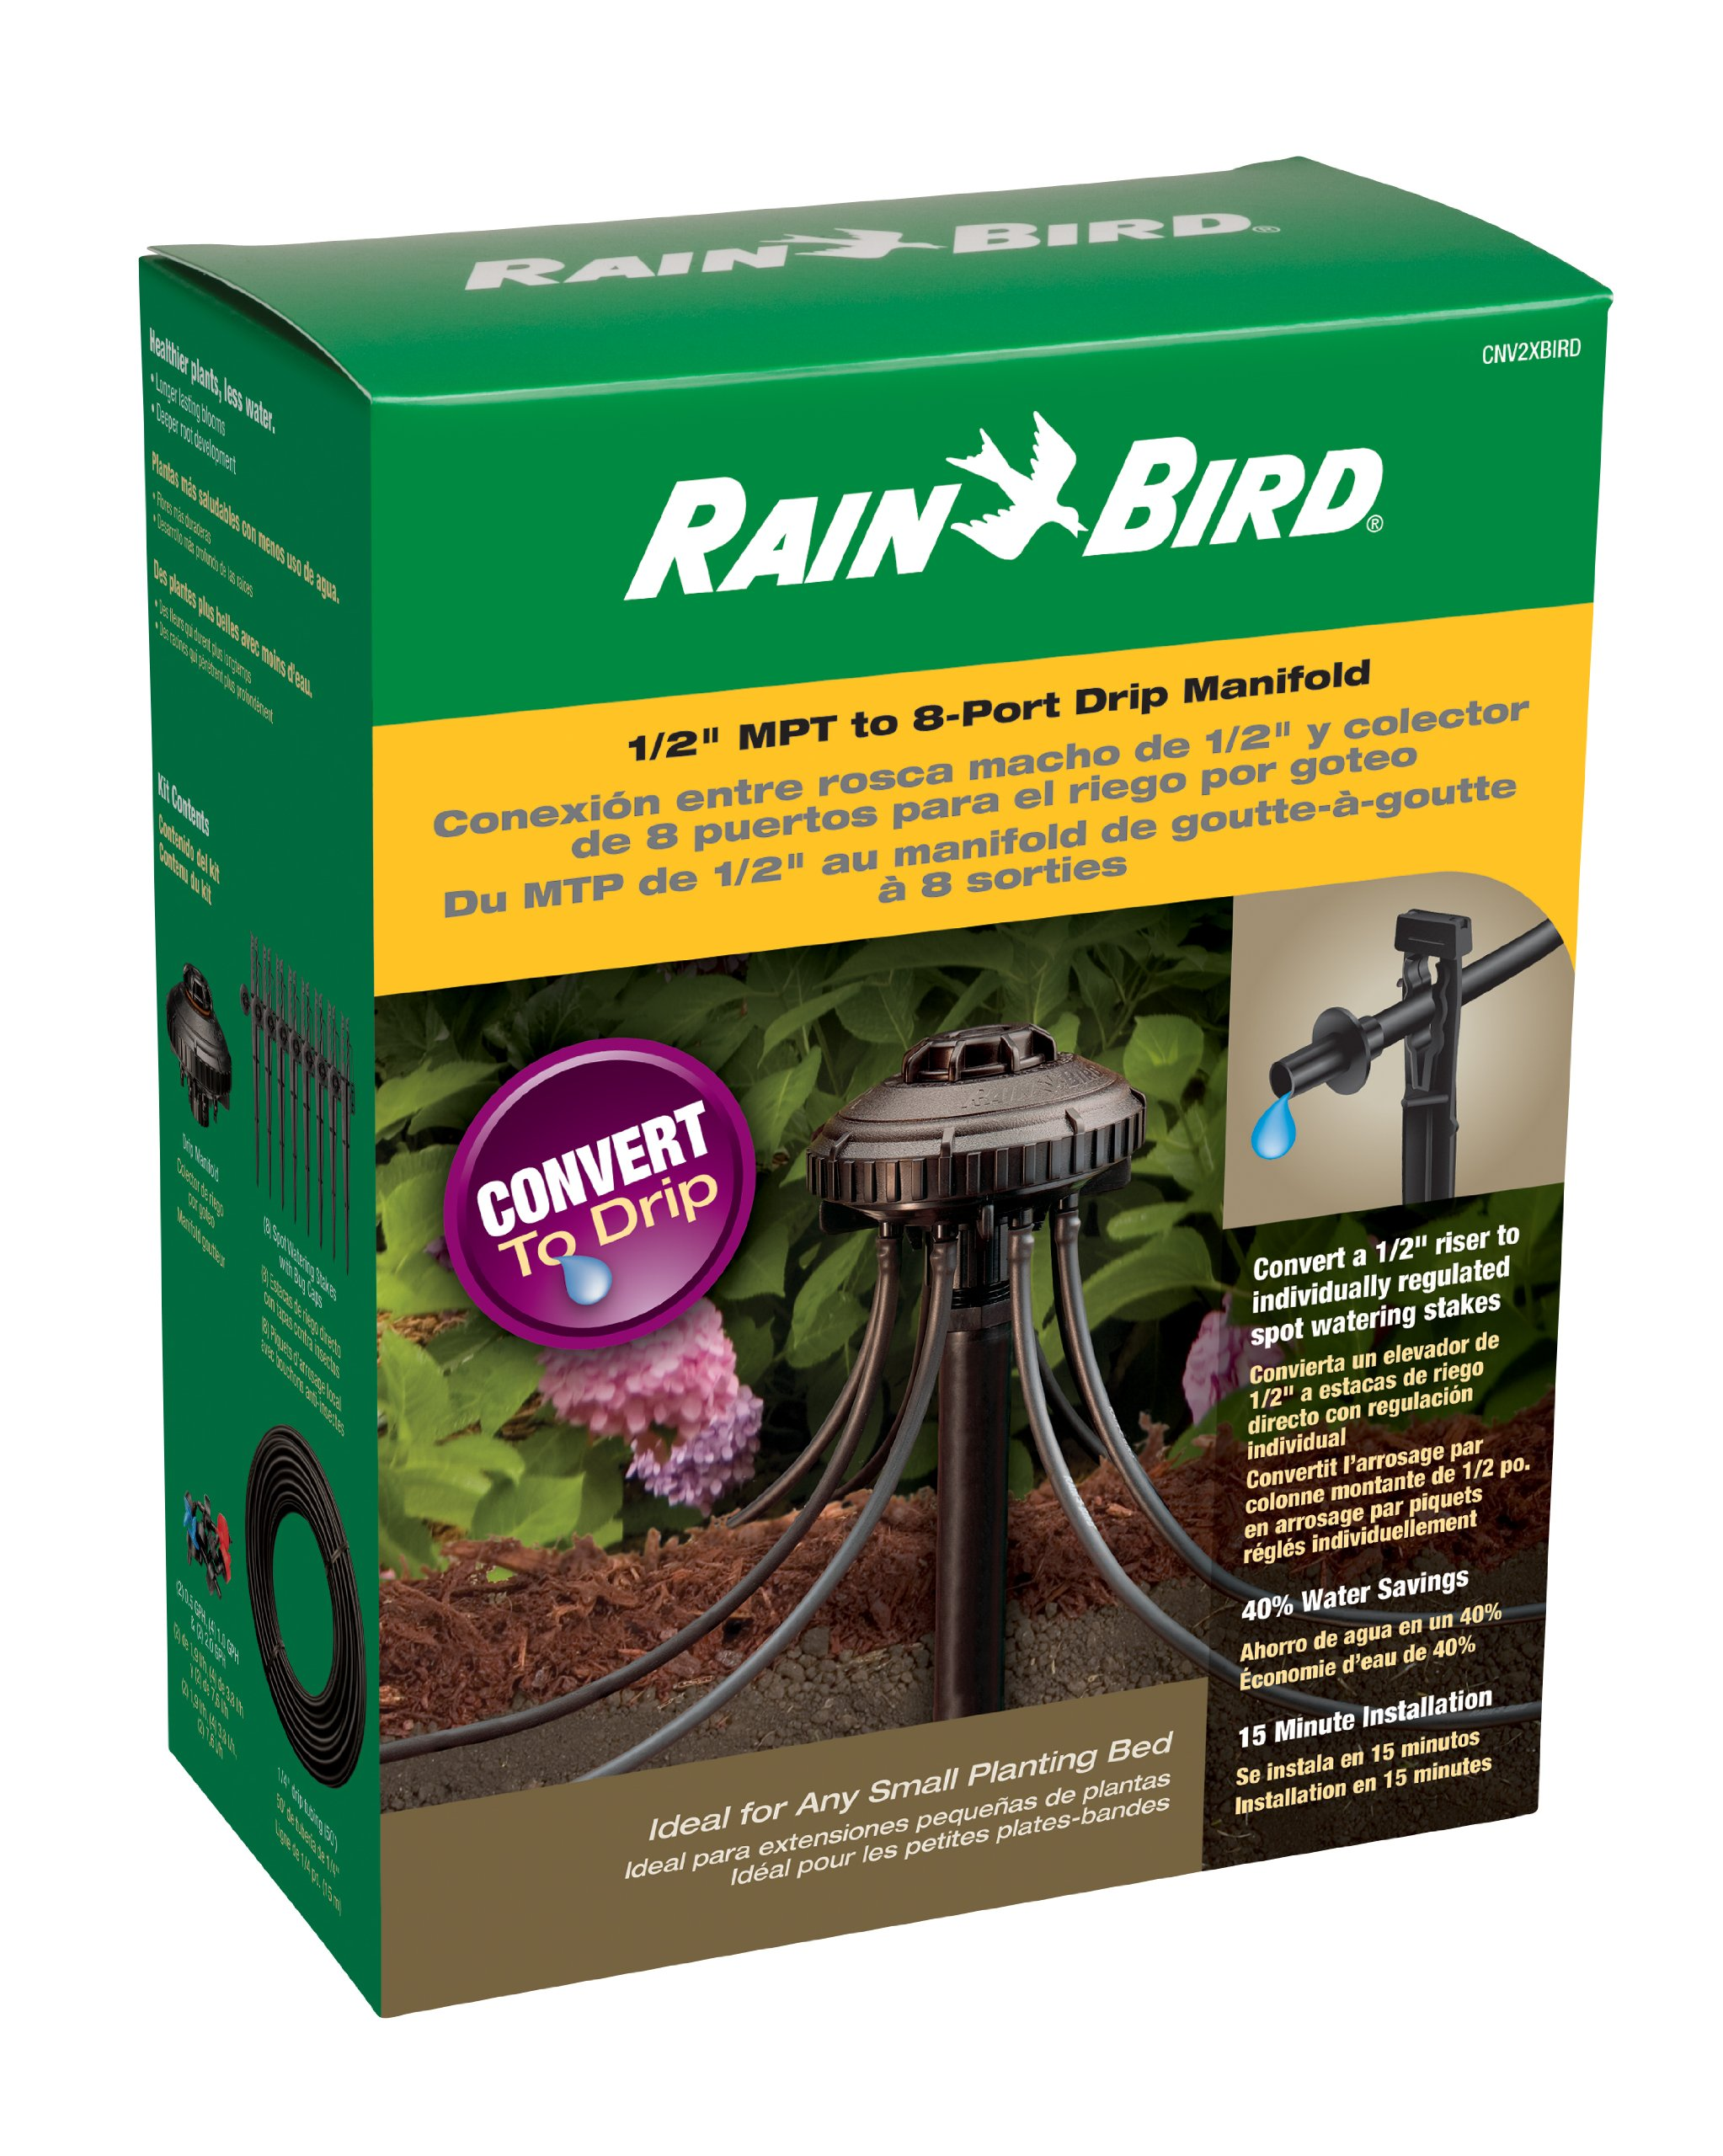 Rain Bird CNV2XBIRD Drip Irrigation Conversion Kit, 1/2'' Riser to 8 Port Drip Manifold with 8 Emitters and 1/4'' Tubing